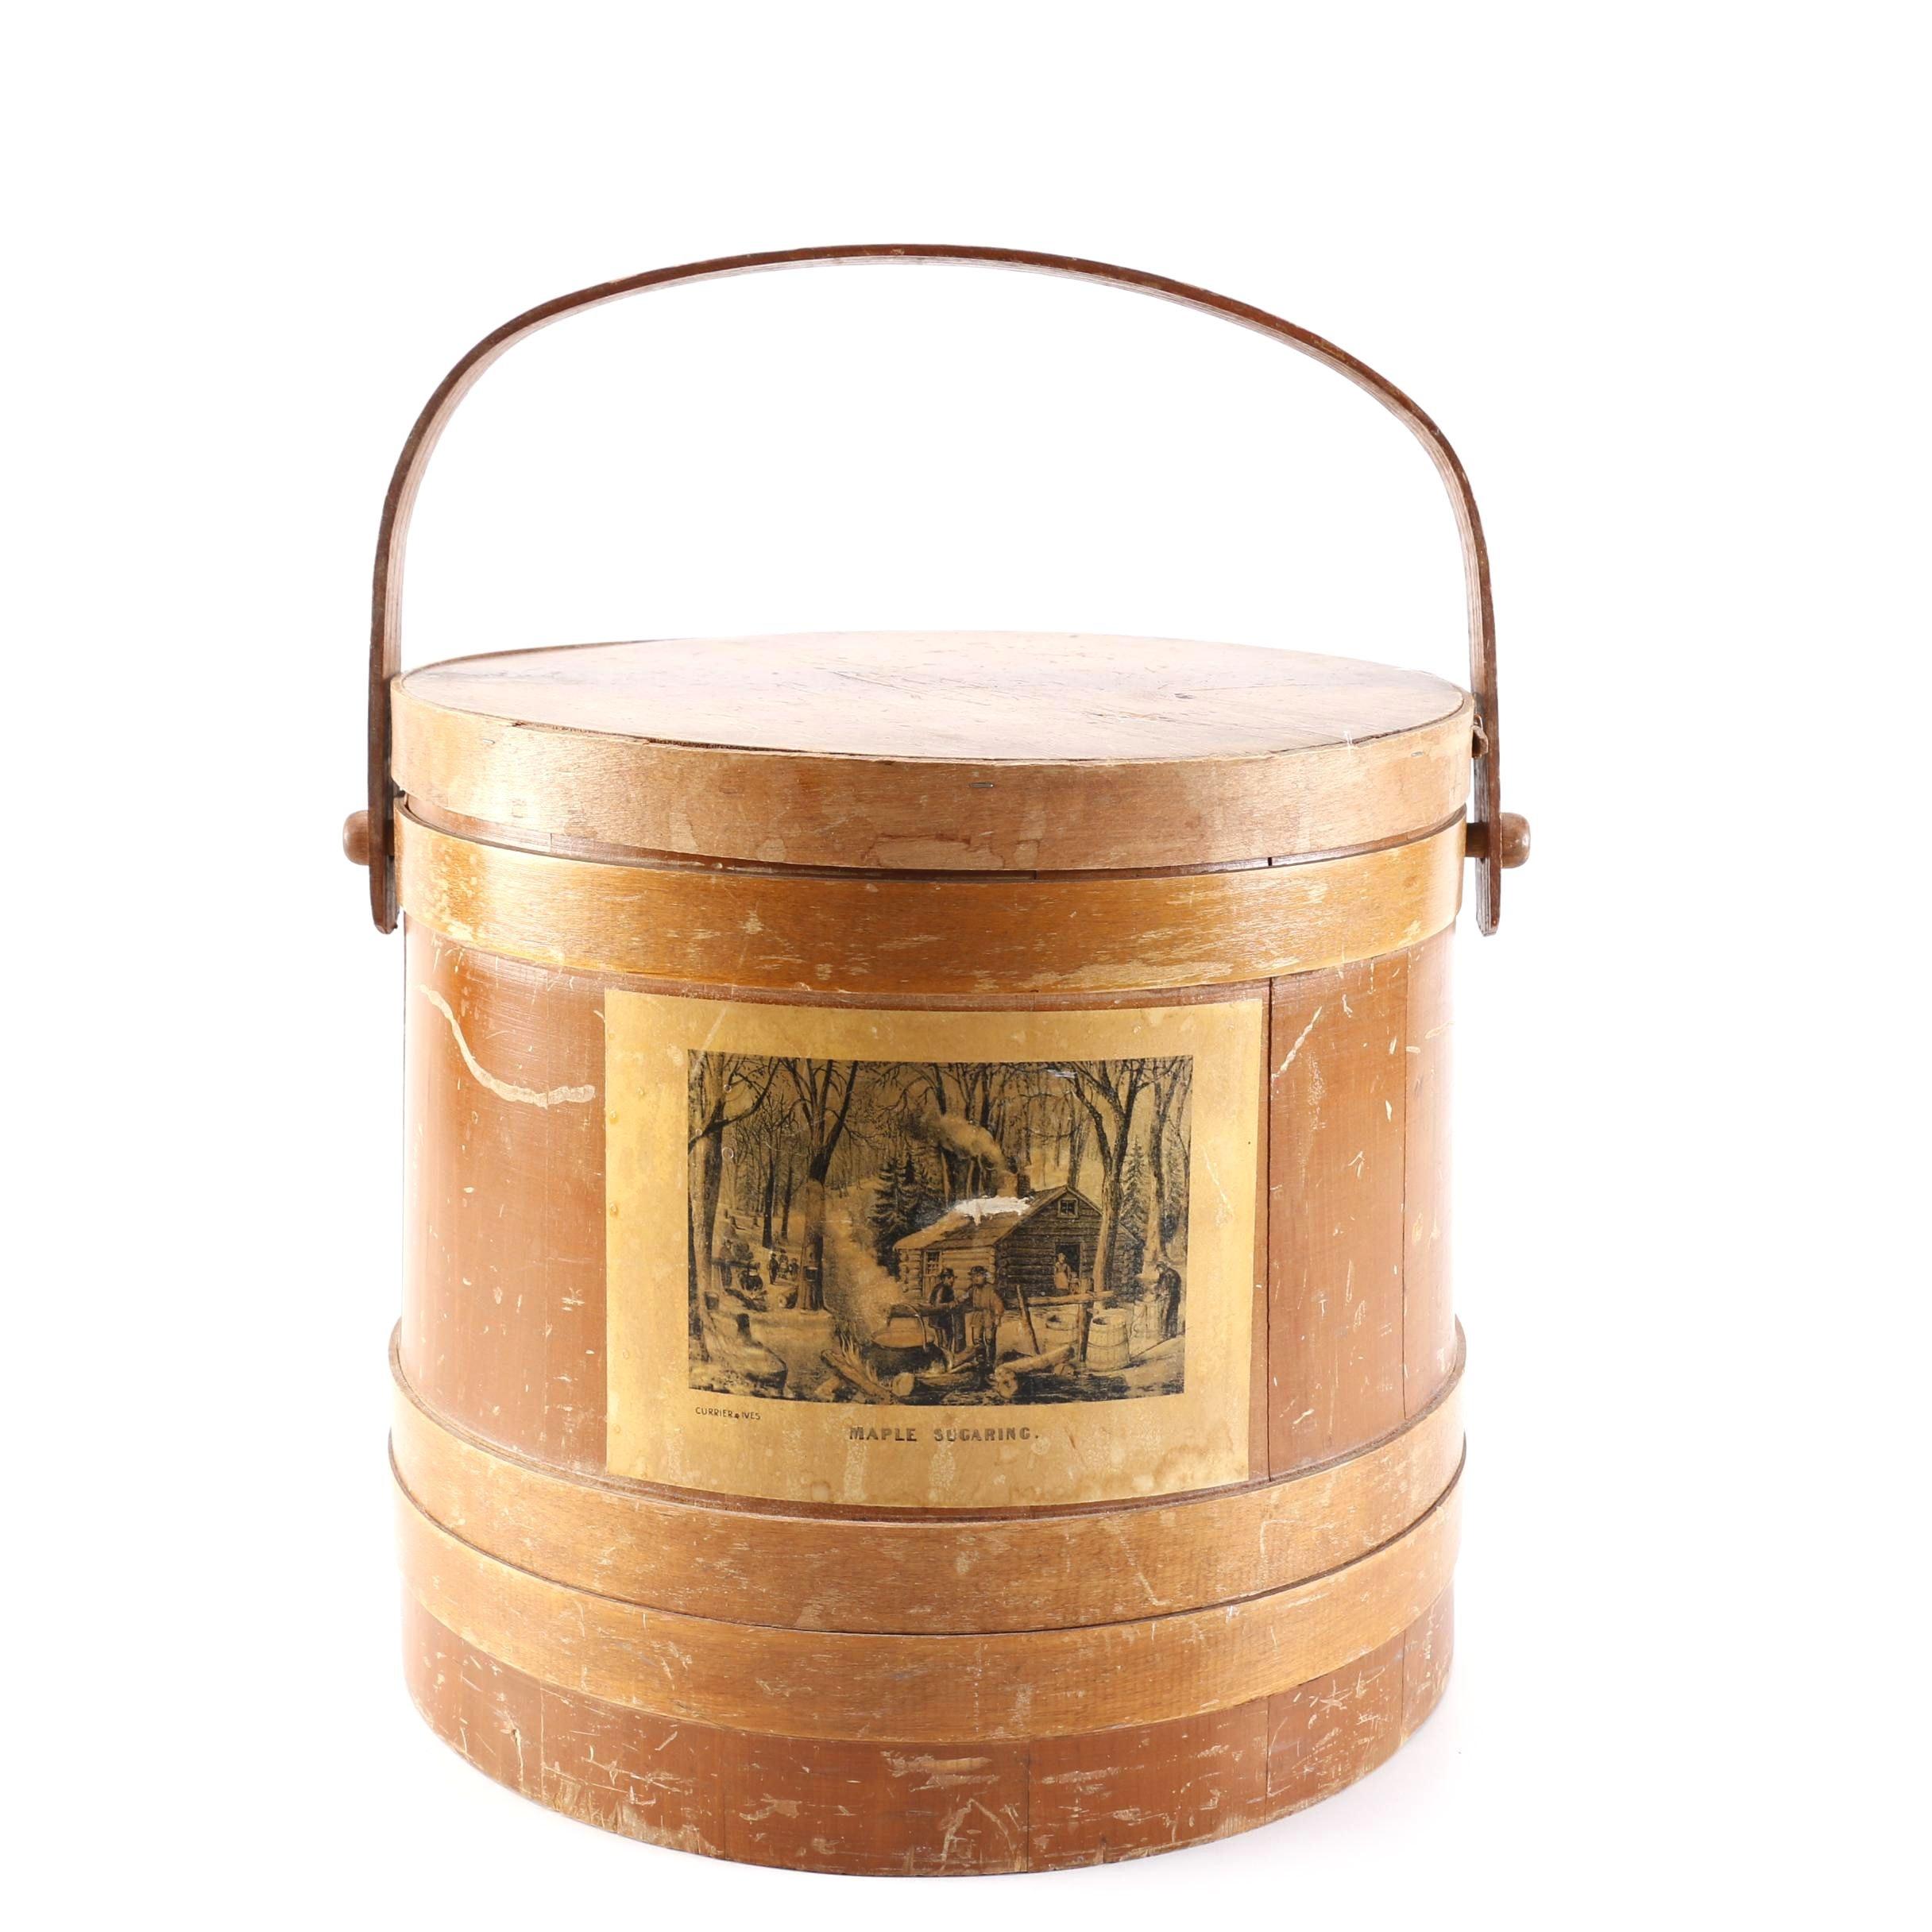 Vintage Bent Wood Shaker Sugar Firkin